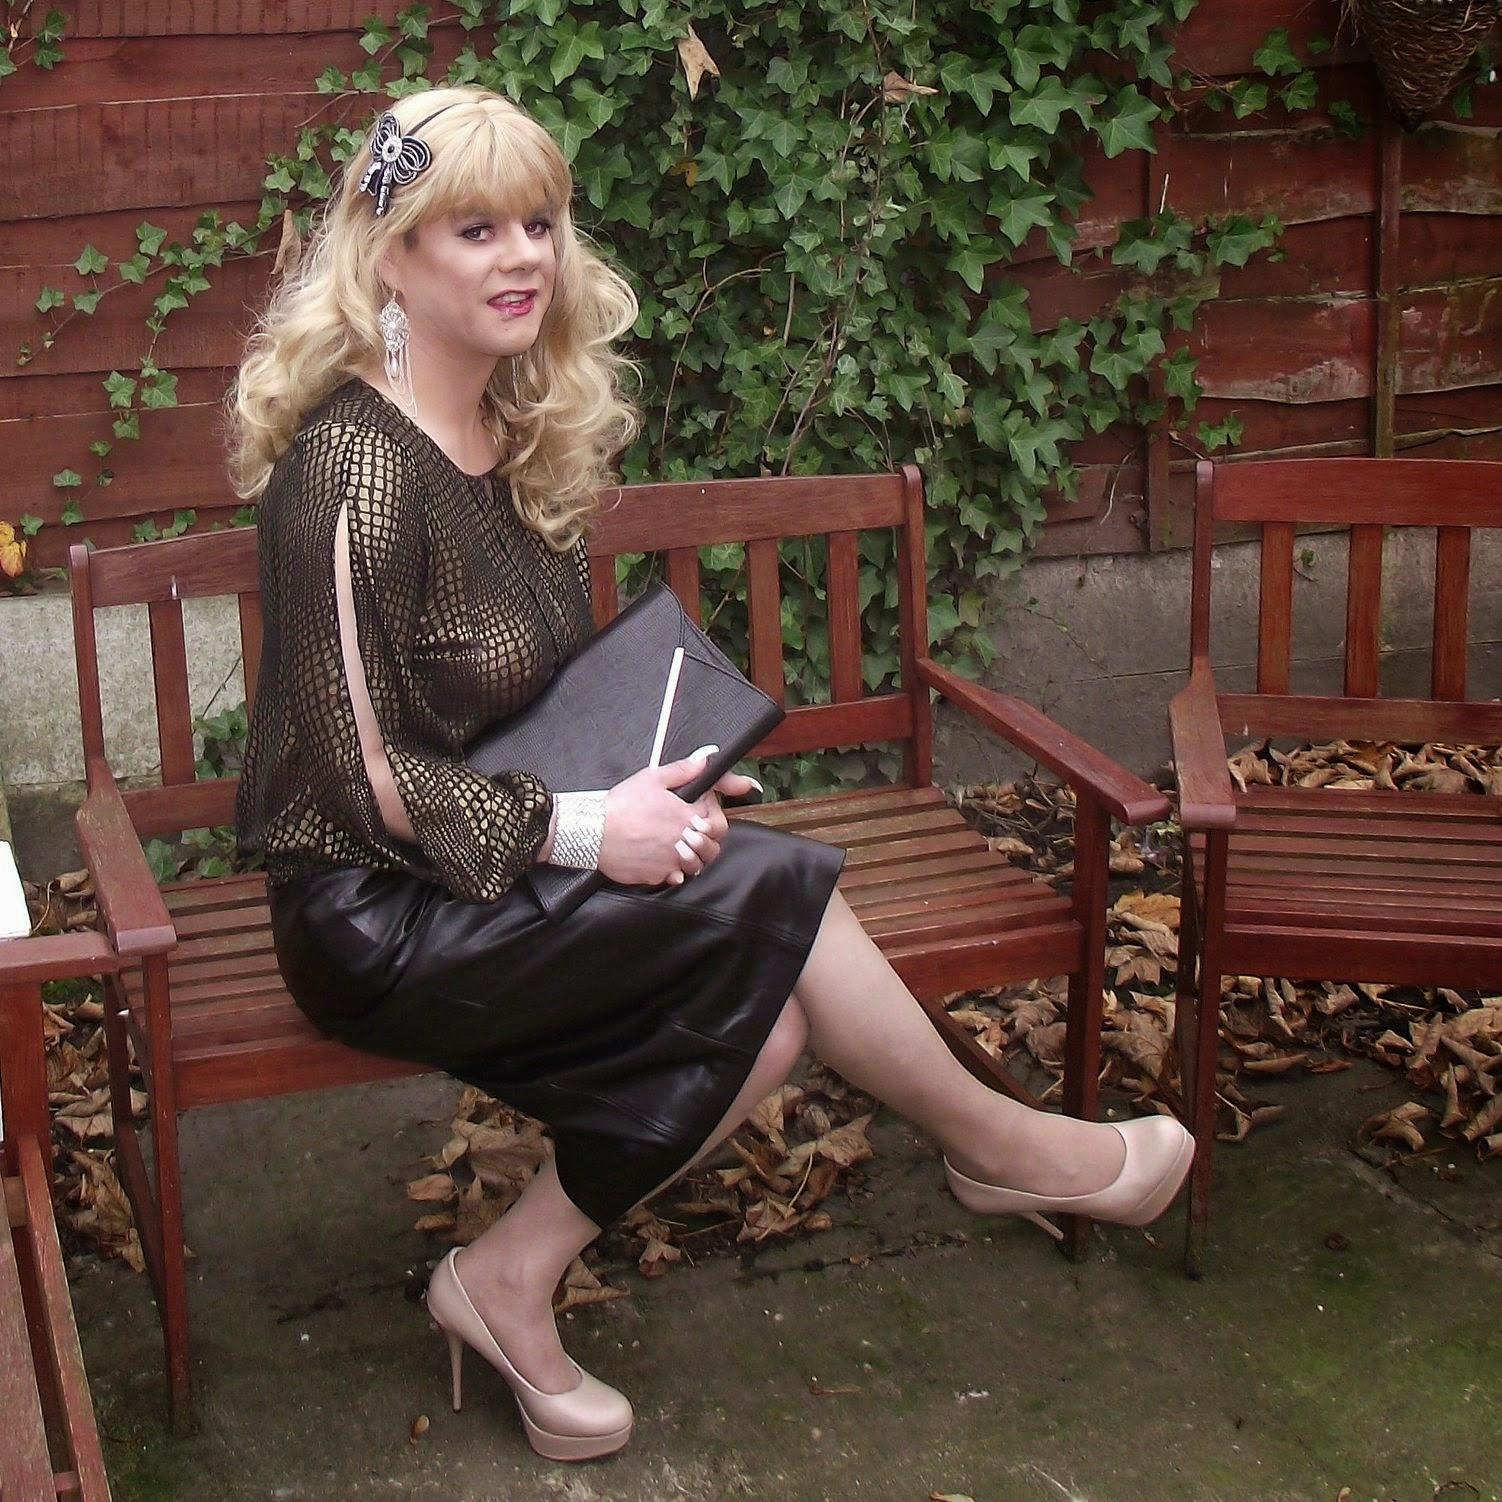 Flickr: Tgirls On Flickr: Carol In Elegant Outfit